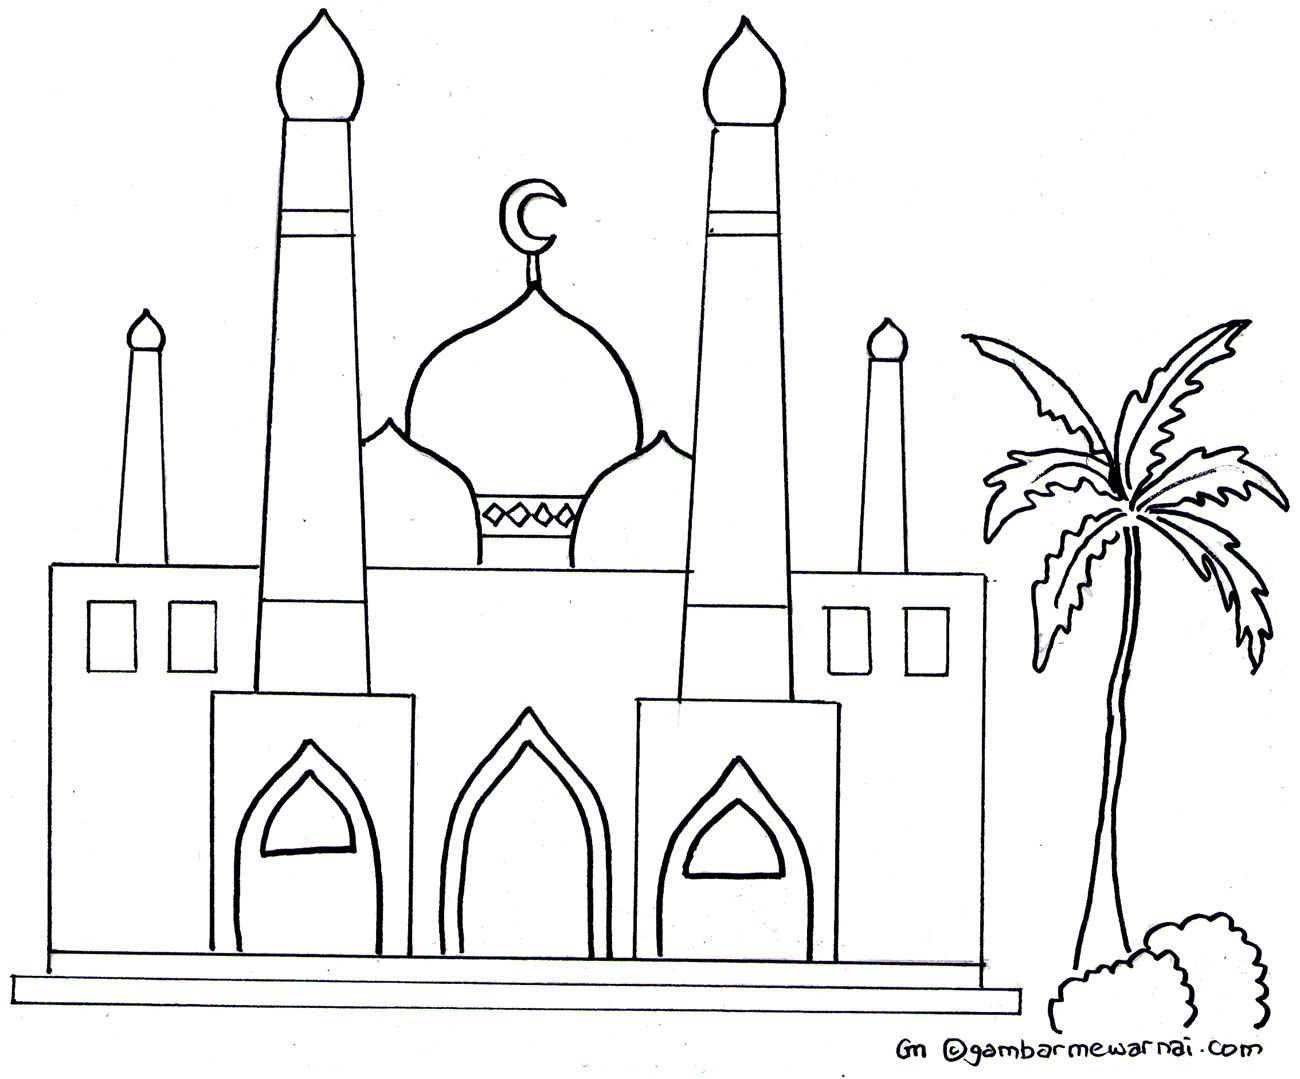 Gambar Mewarnai Masjid Dengan Gambar Buku Mewarnai Buku